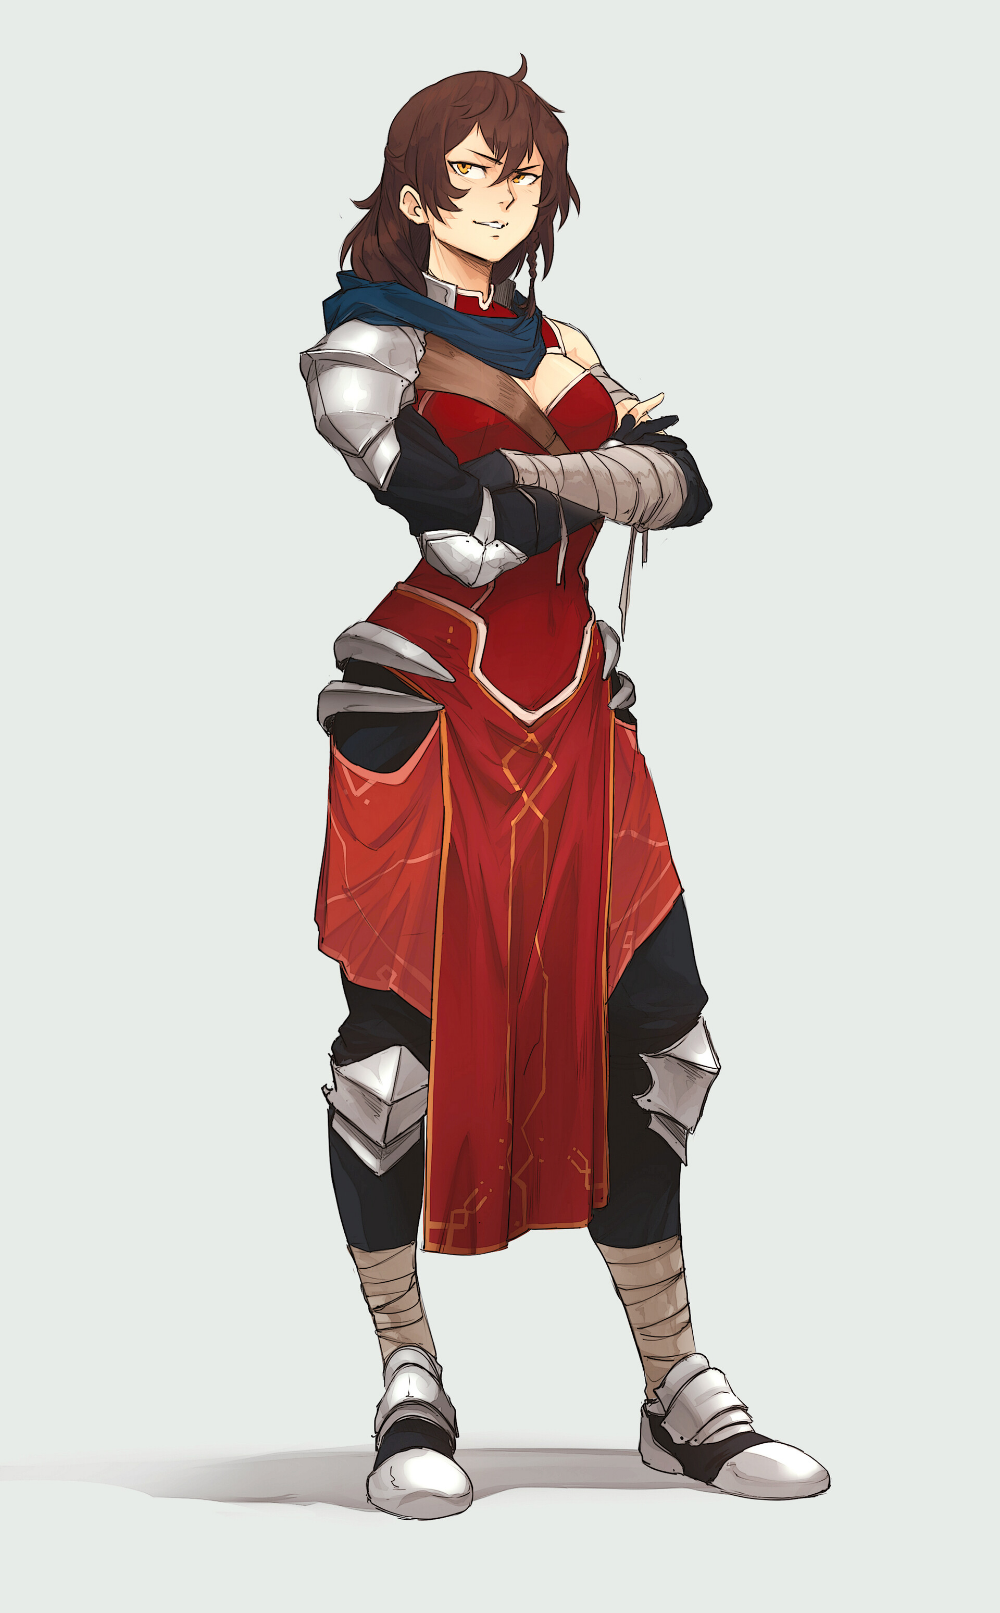 ArtStation - Celtchair - Commission Character Design, Sol